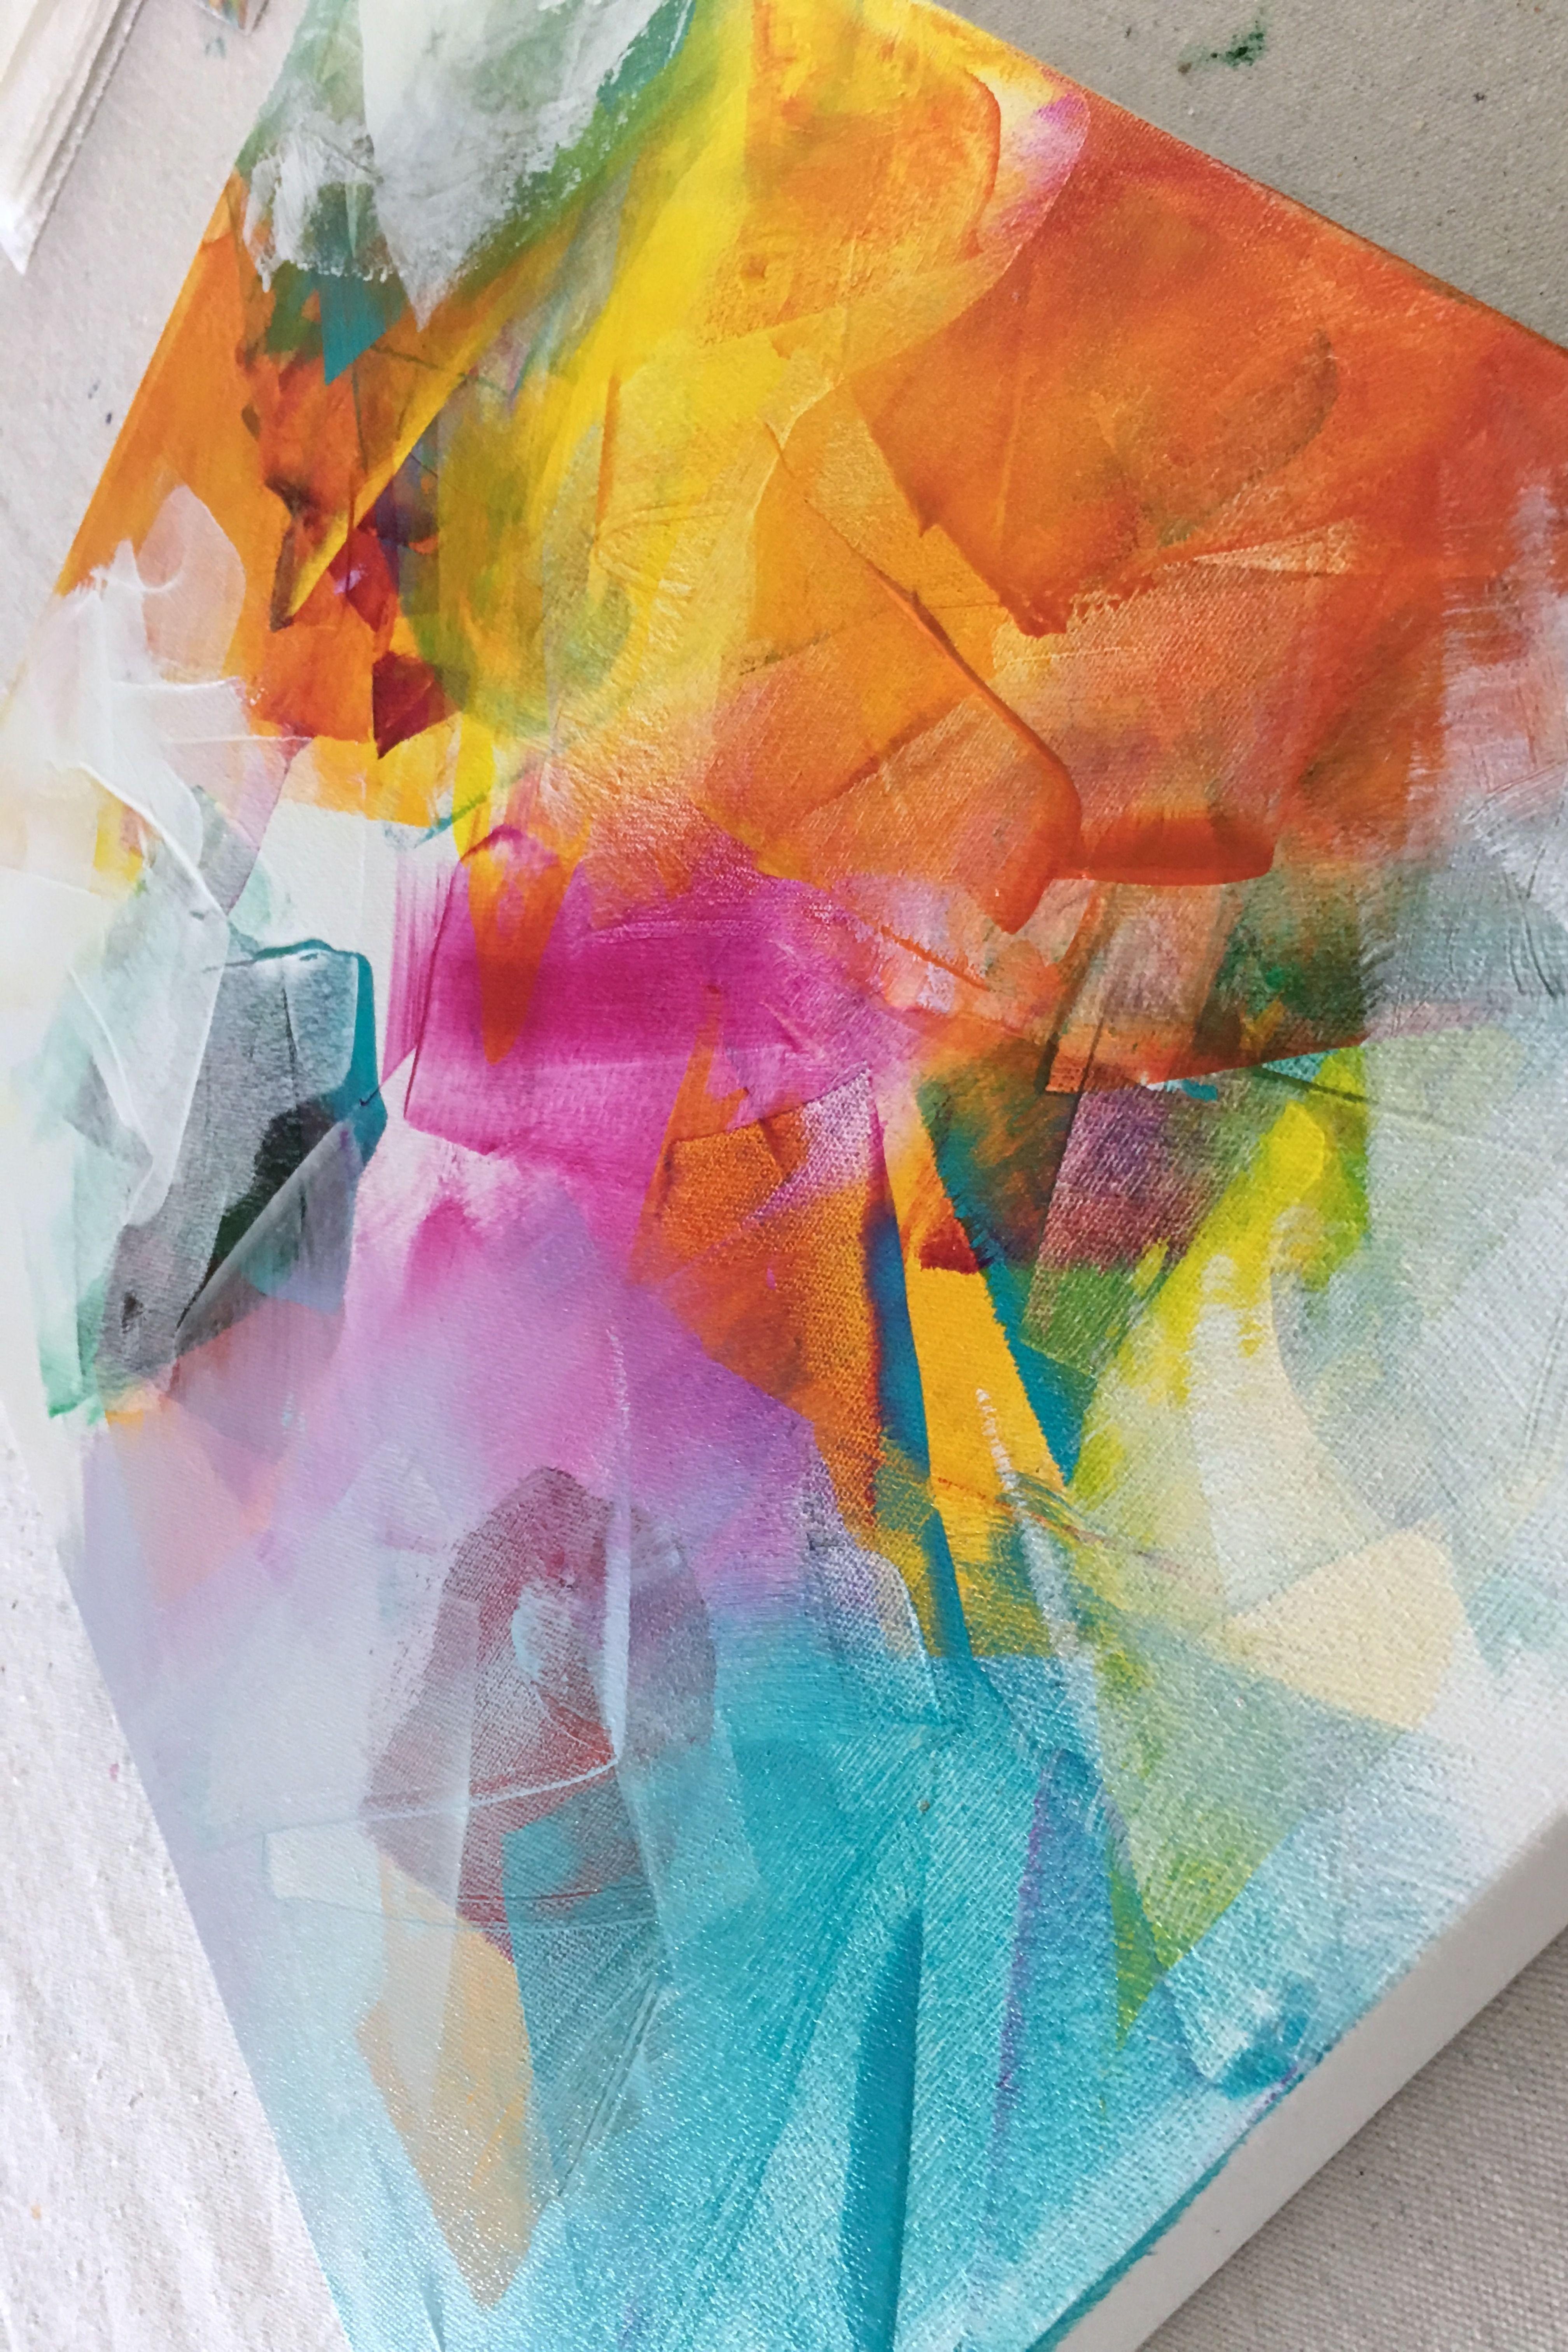 Layering Acrylic Paint Abstract Art Painting Colorful Abstract Painting Bright Abstract Art